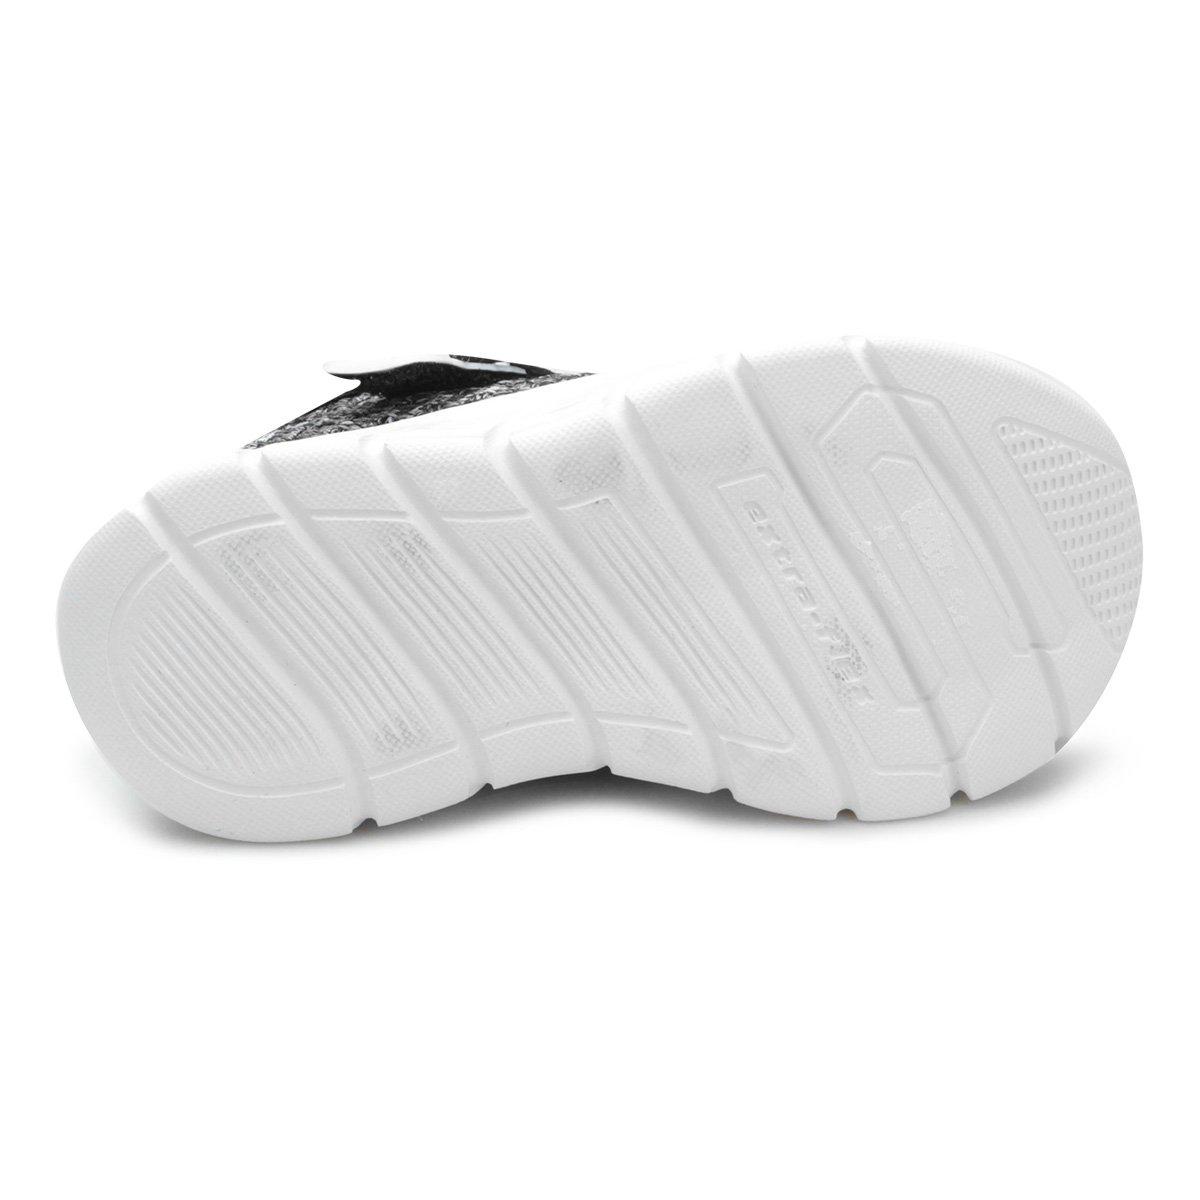 527a00cc4e Tênis Infantil Skechers Comfy Flex Easy Pac Masculino - Mescla ...